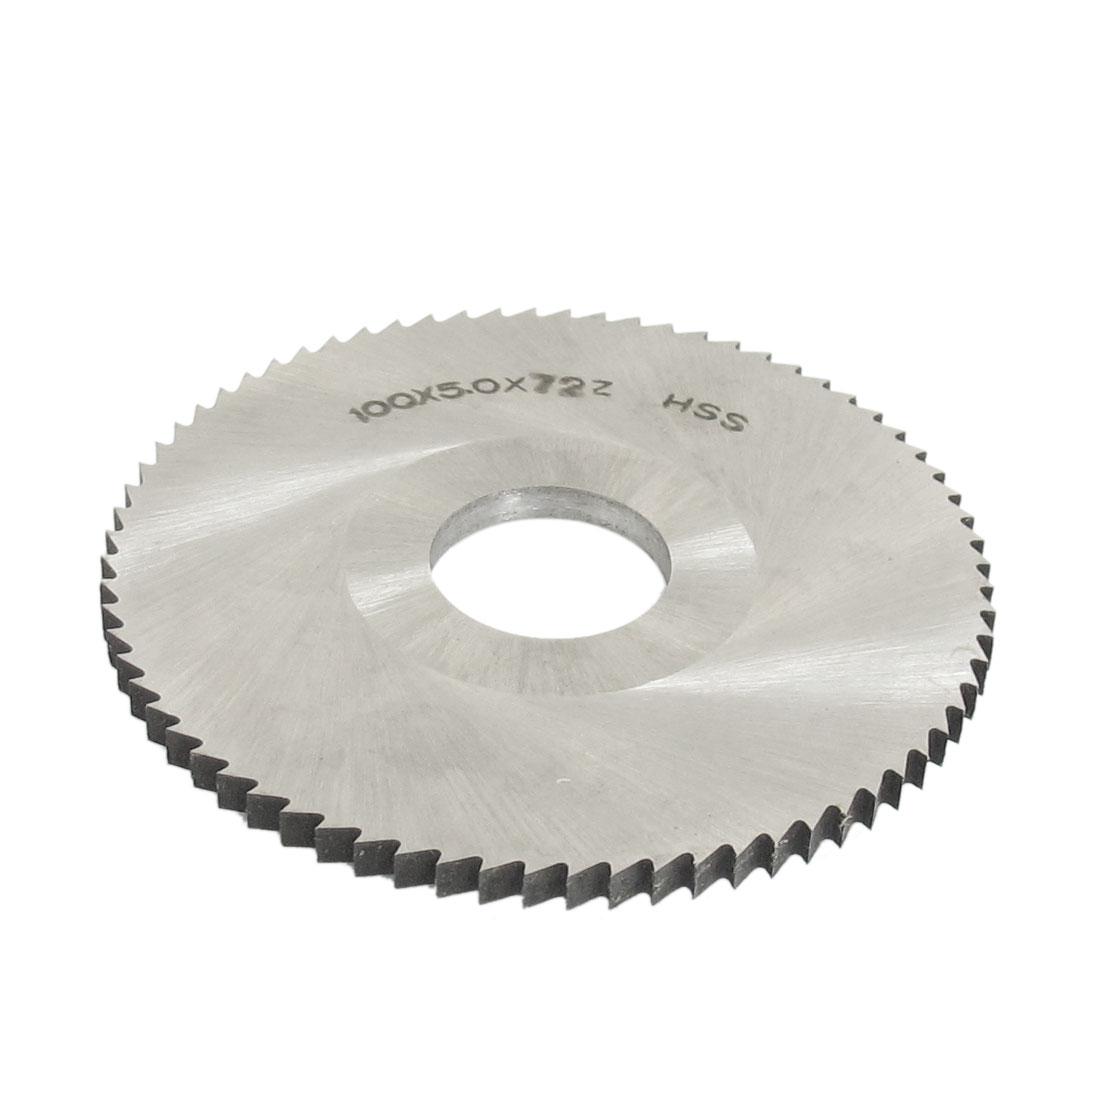 100mm Dia 5mm Thickness 72 Teeth HSS Circular Blade Slitting Saw